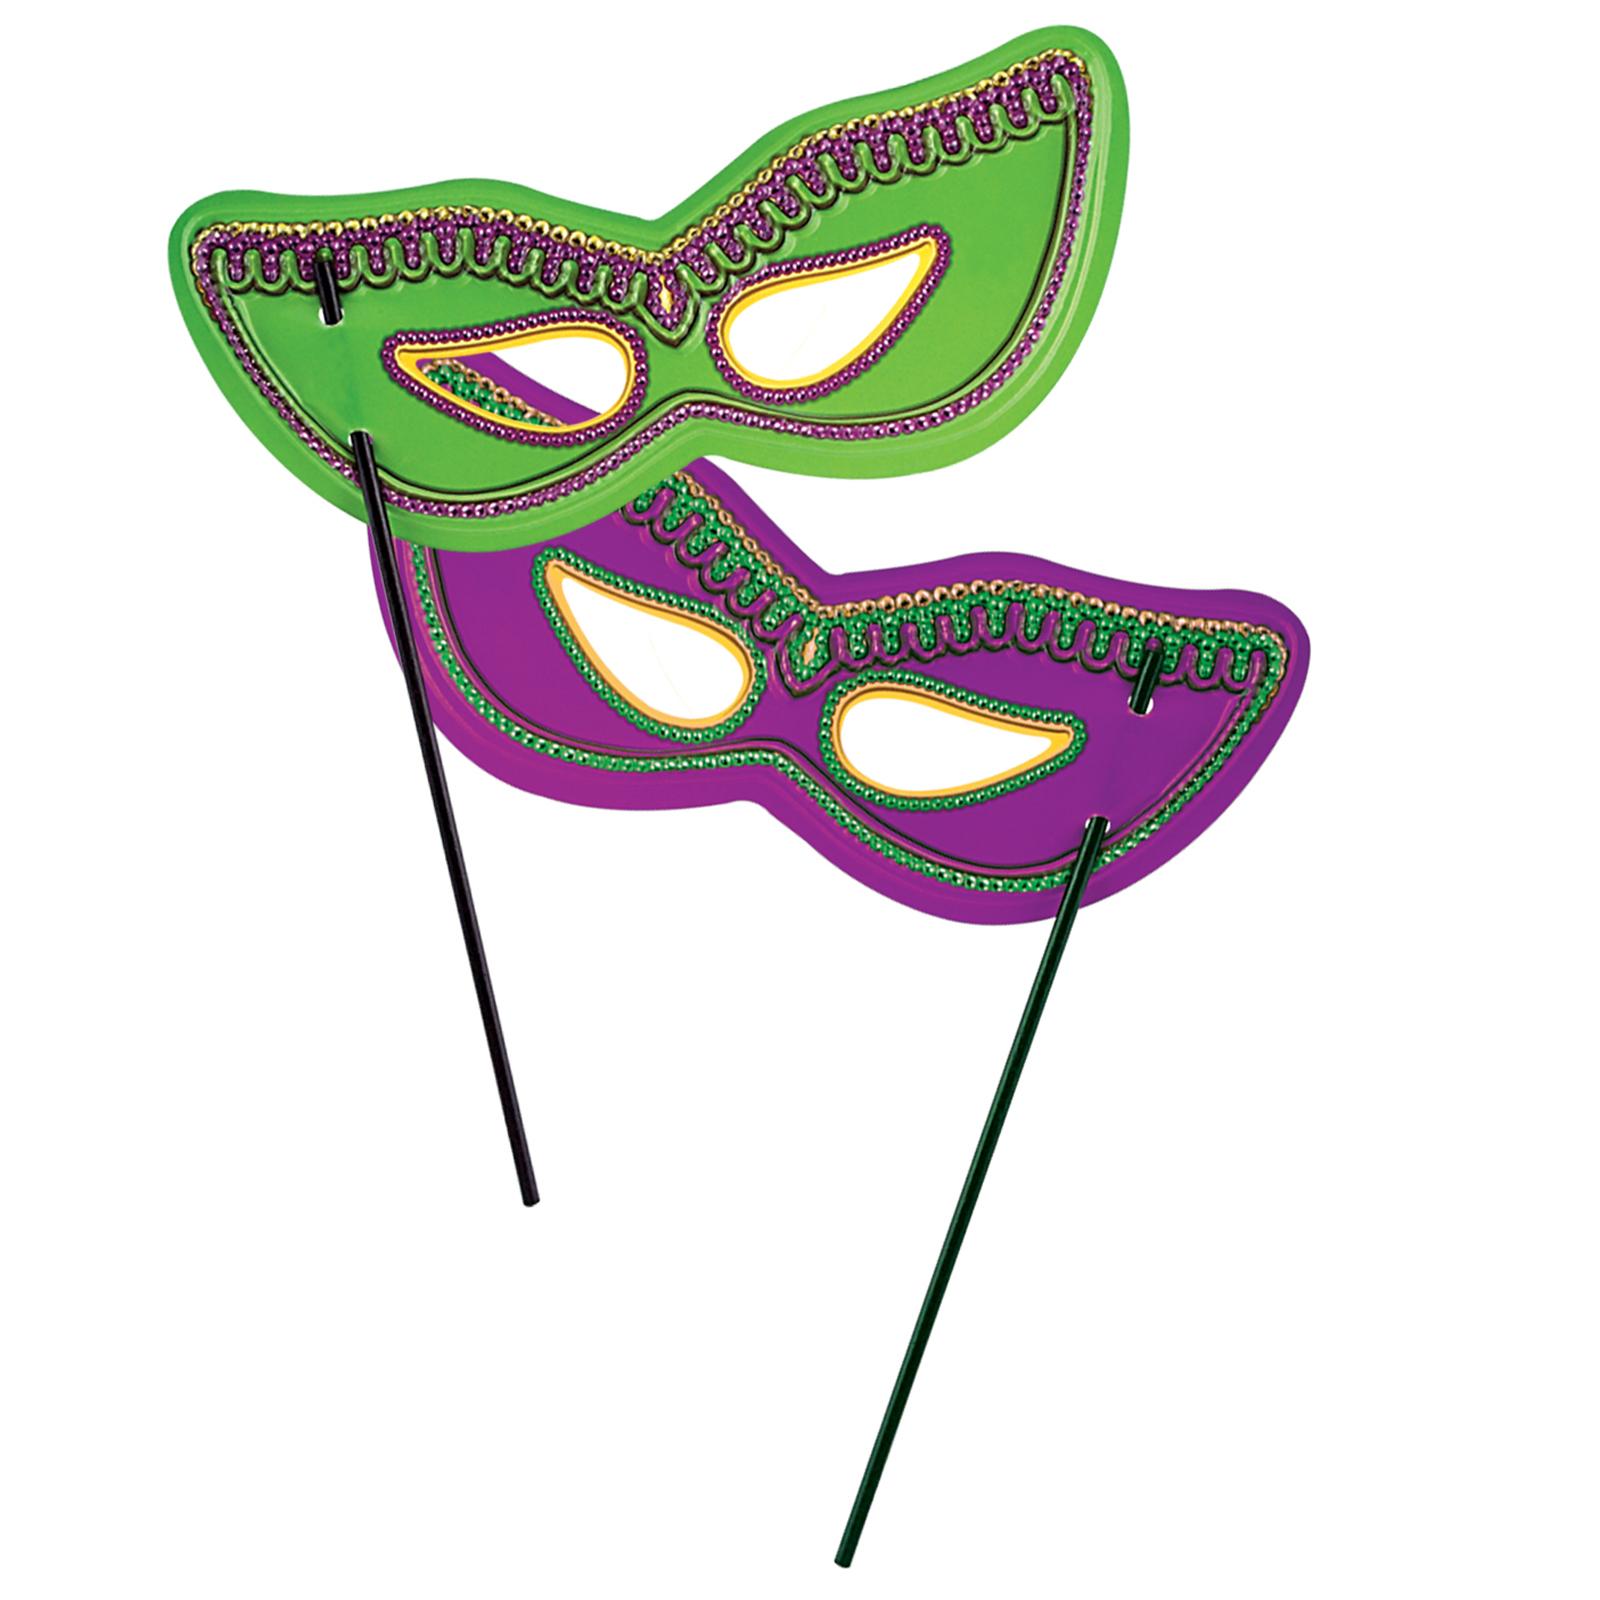 1600x1600 Mardi Gras Mask Clip Art Many Interesting Cliparts